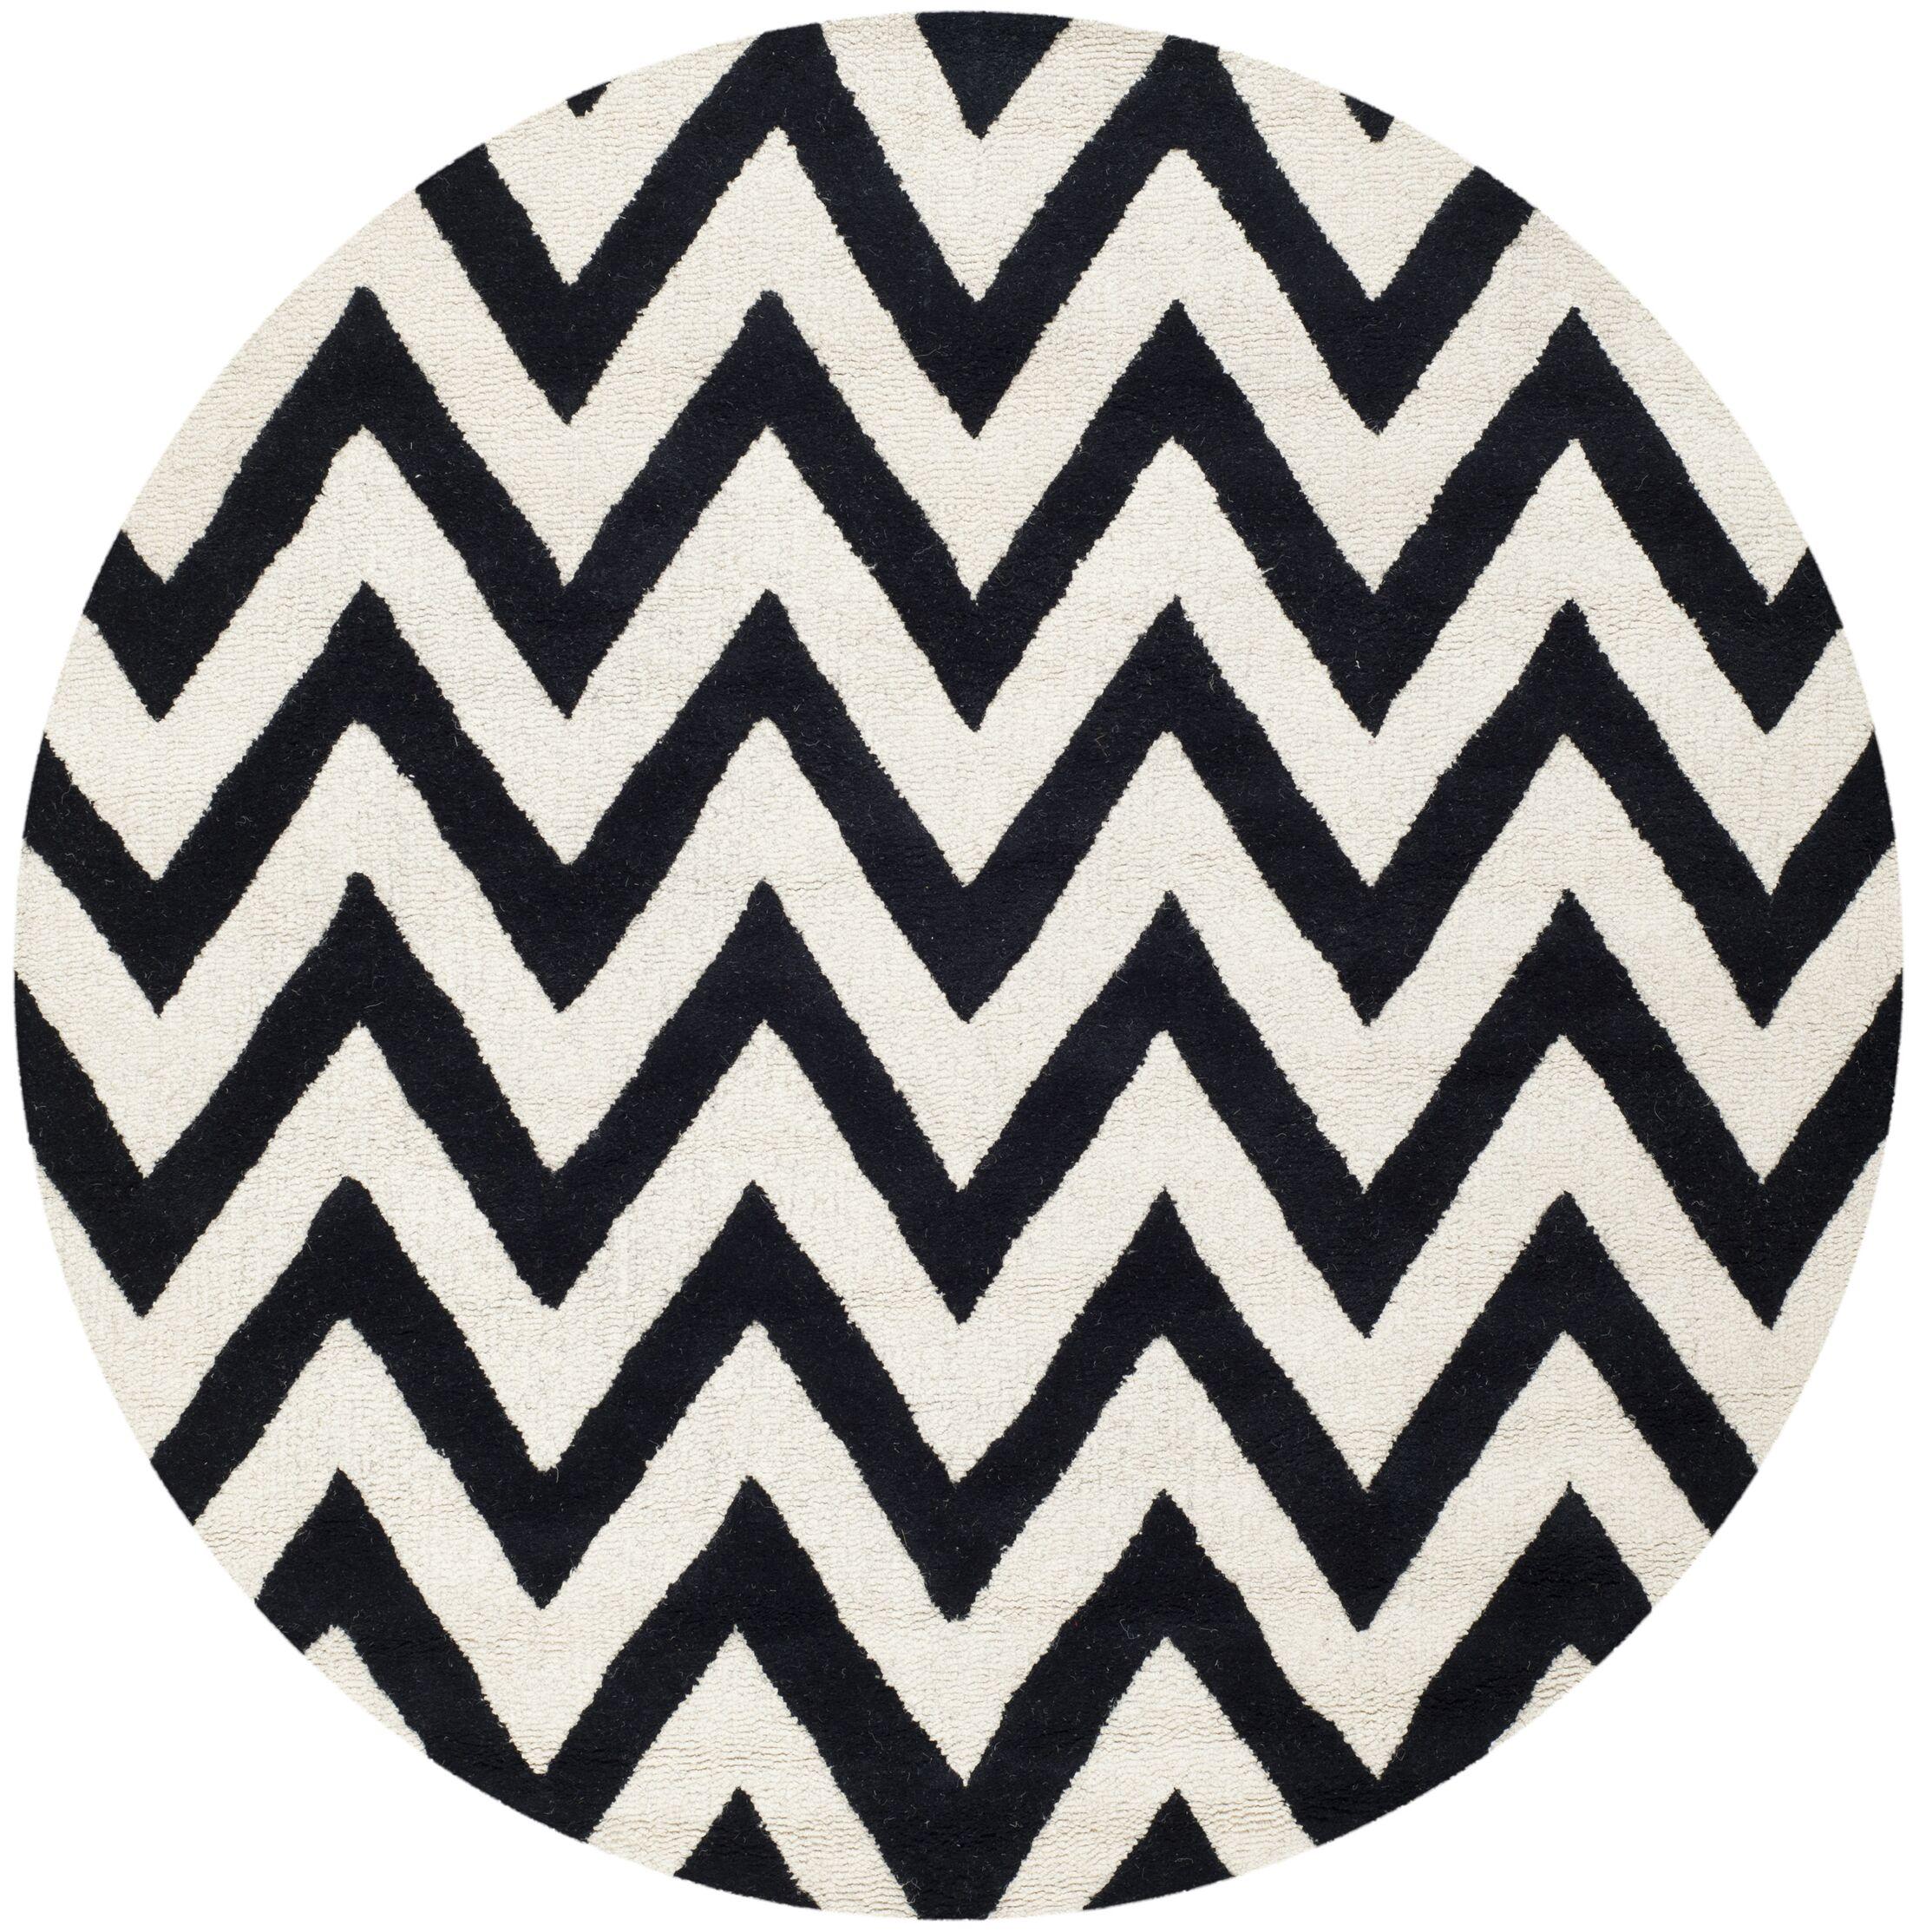 Daveney Hand-Tufted Wool Black/Ivory Area Rug Rug Size: Round 4'